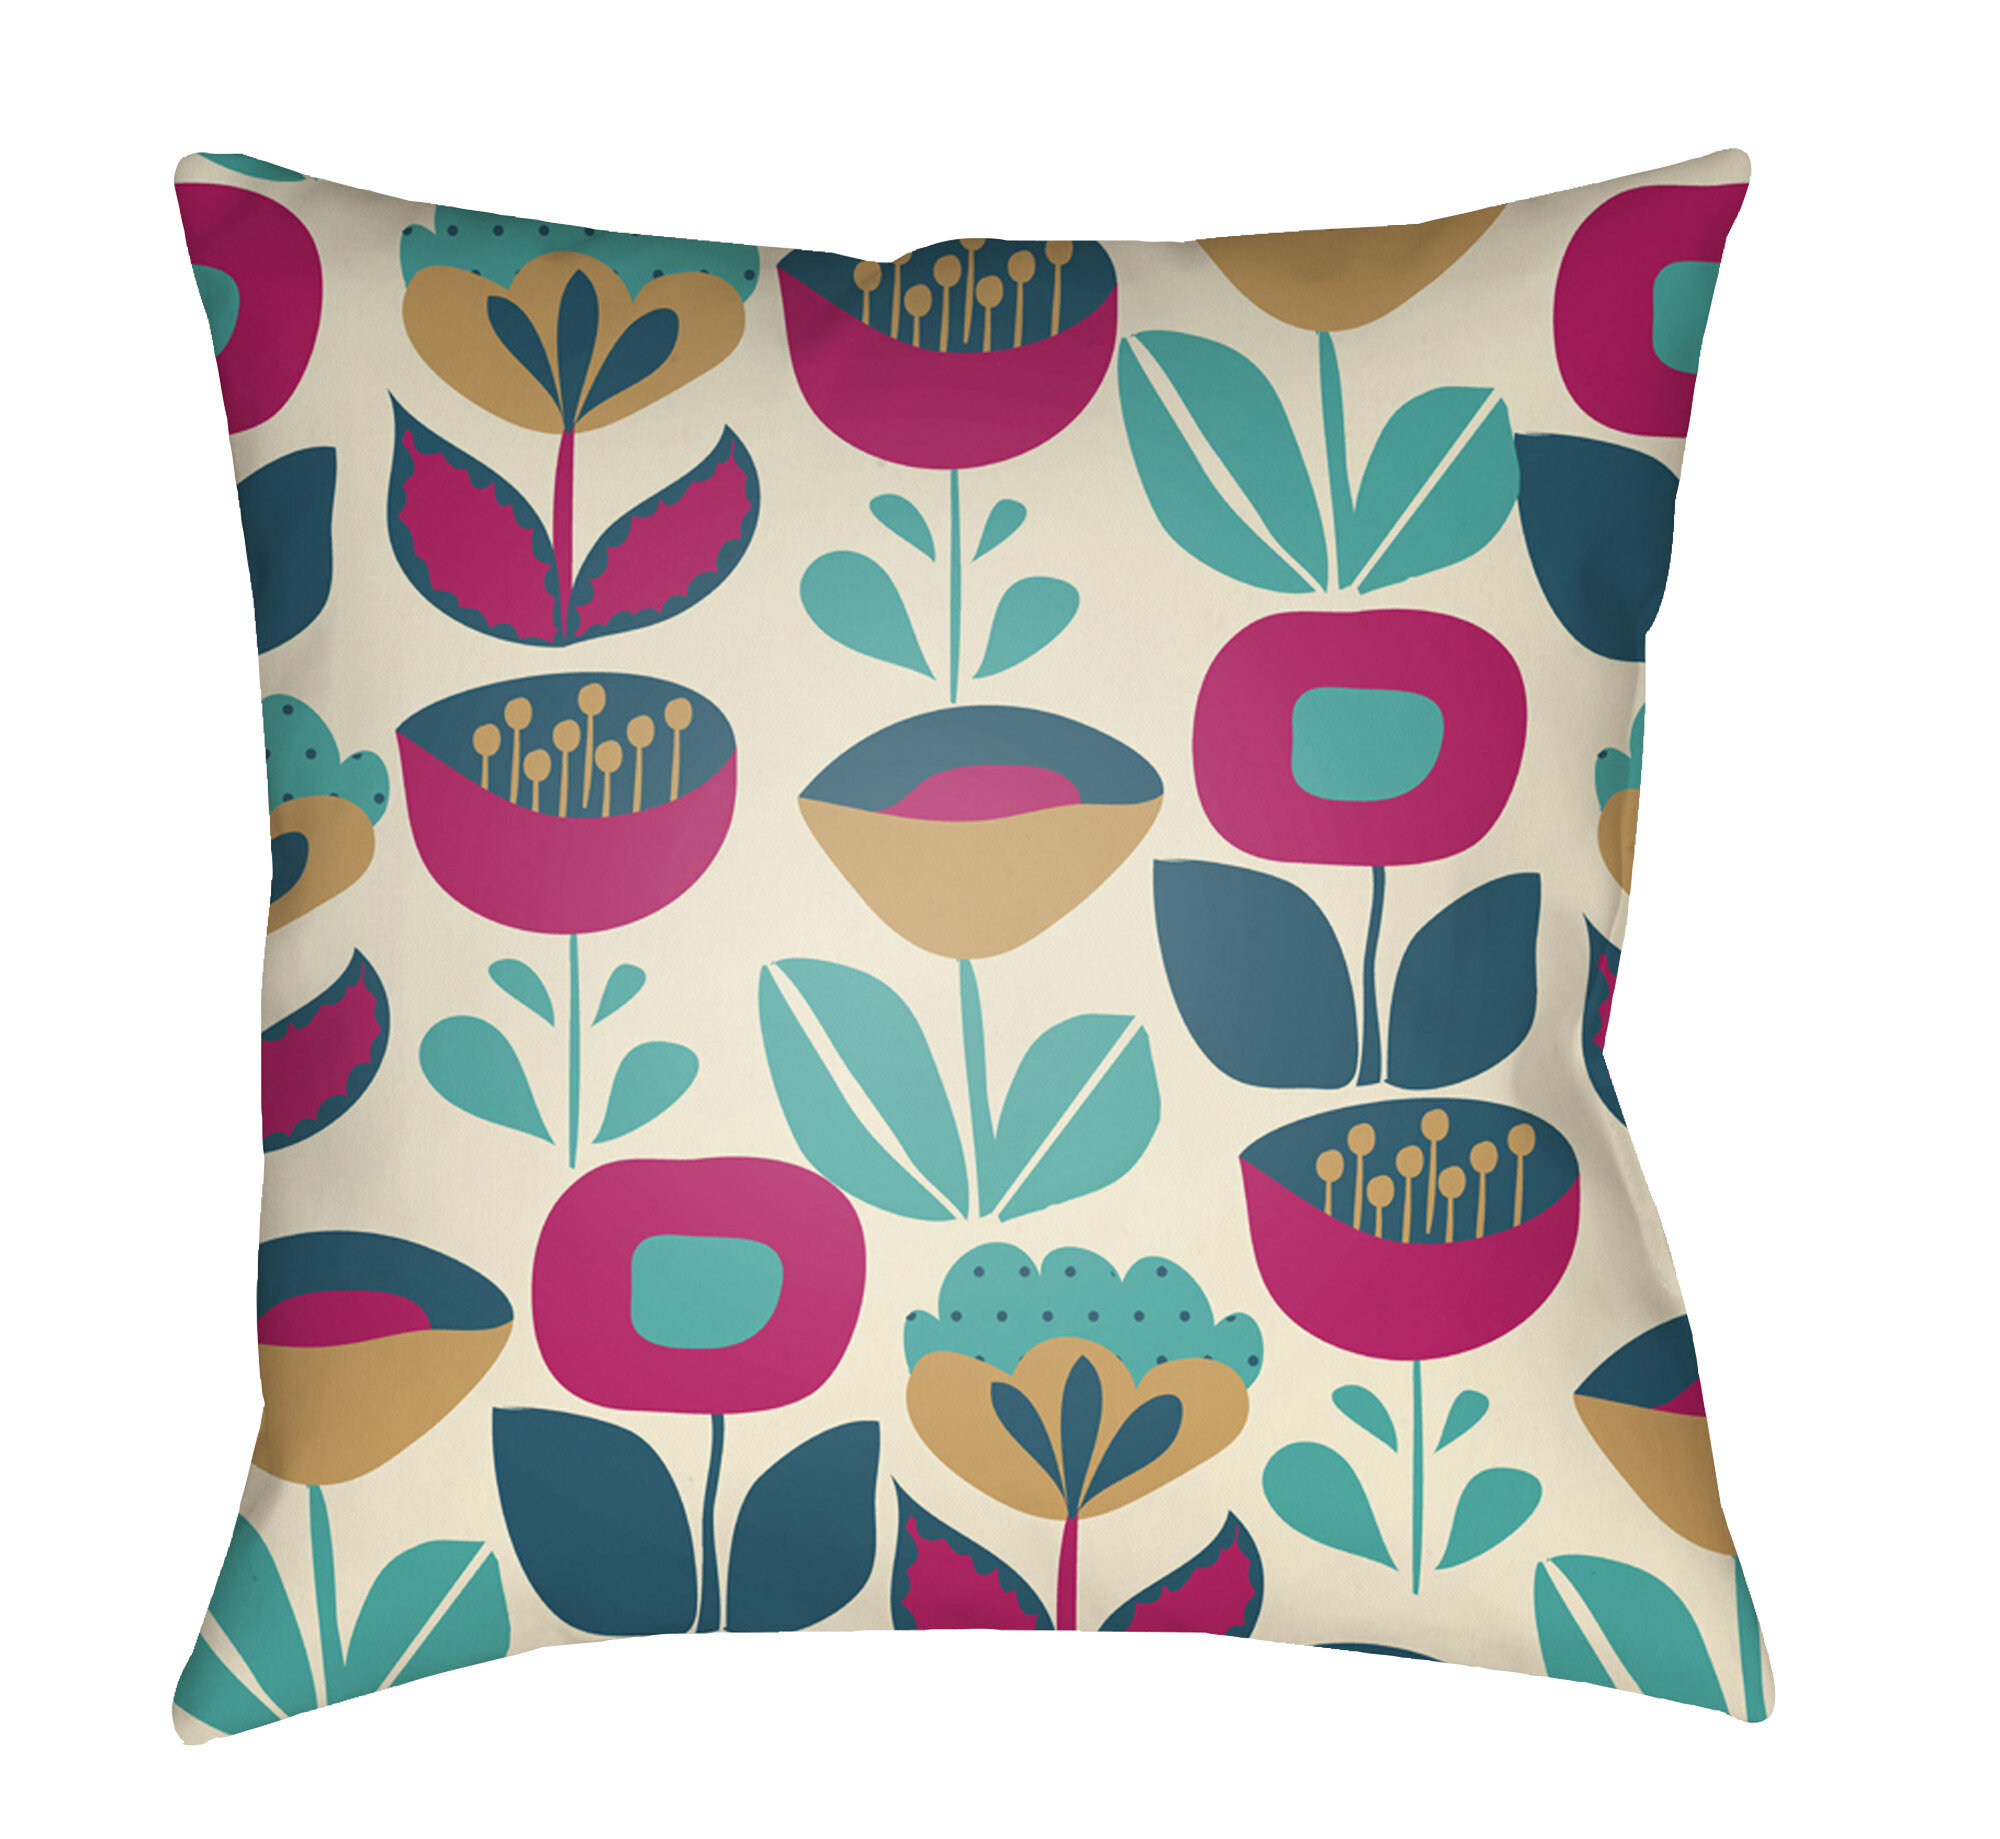 Floral Harriet Bee Throw Pillows You Ll Love In 2021 Wayfair